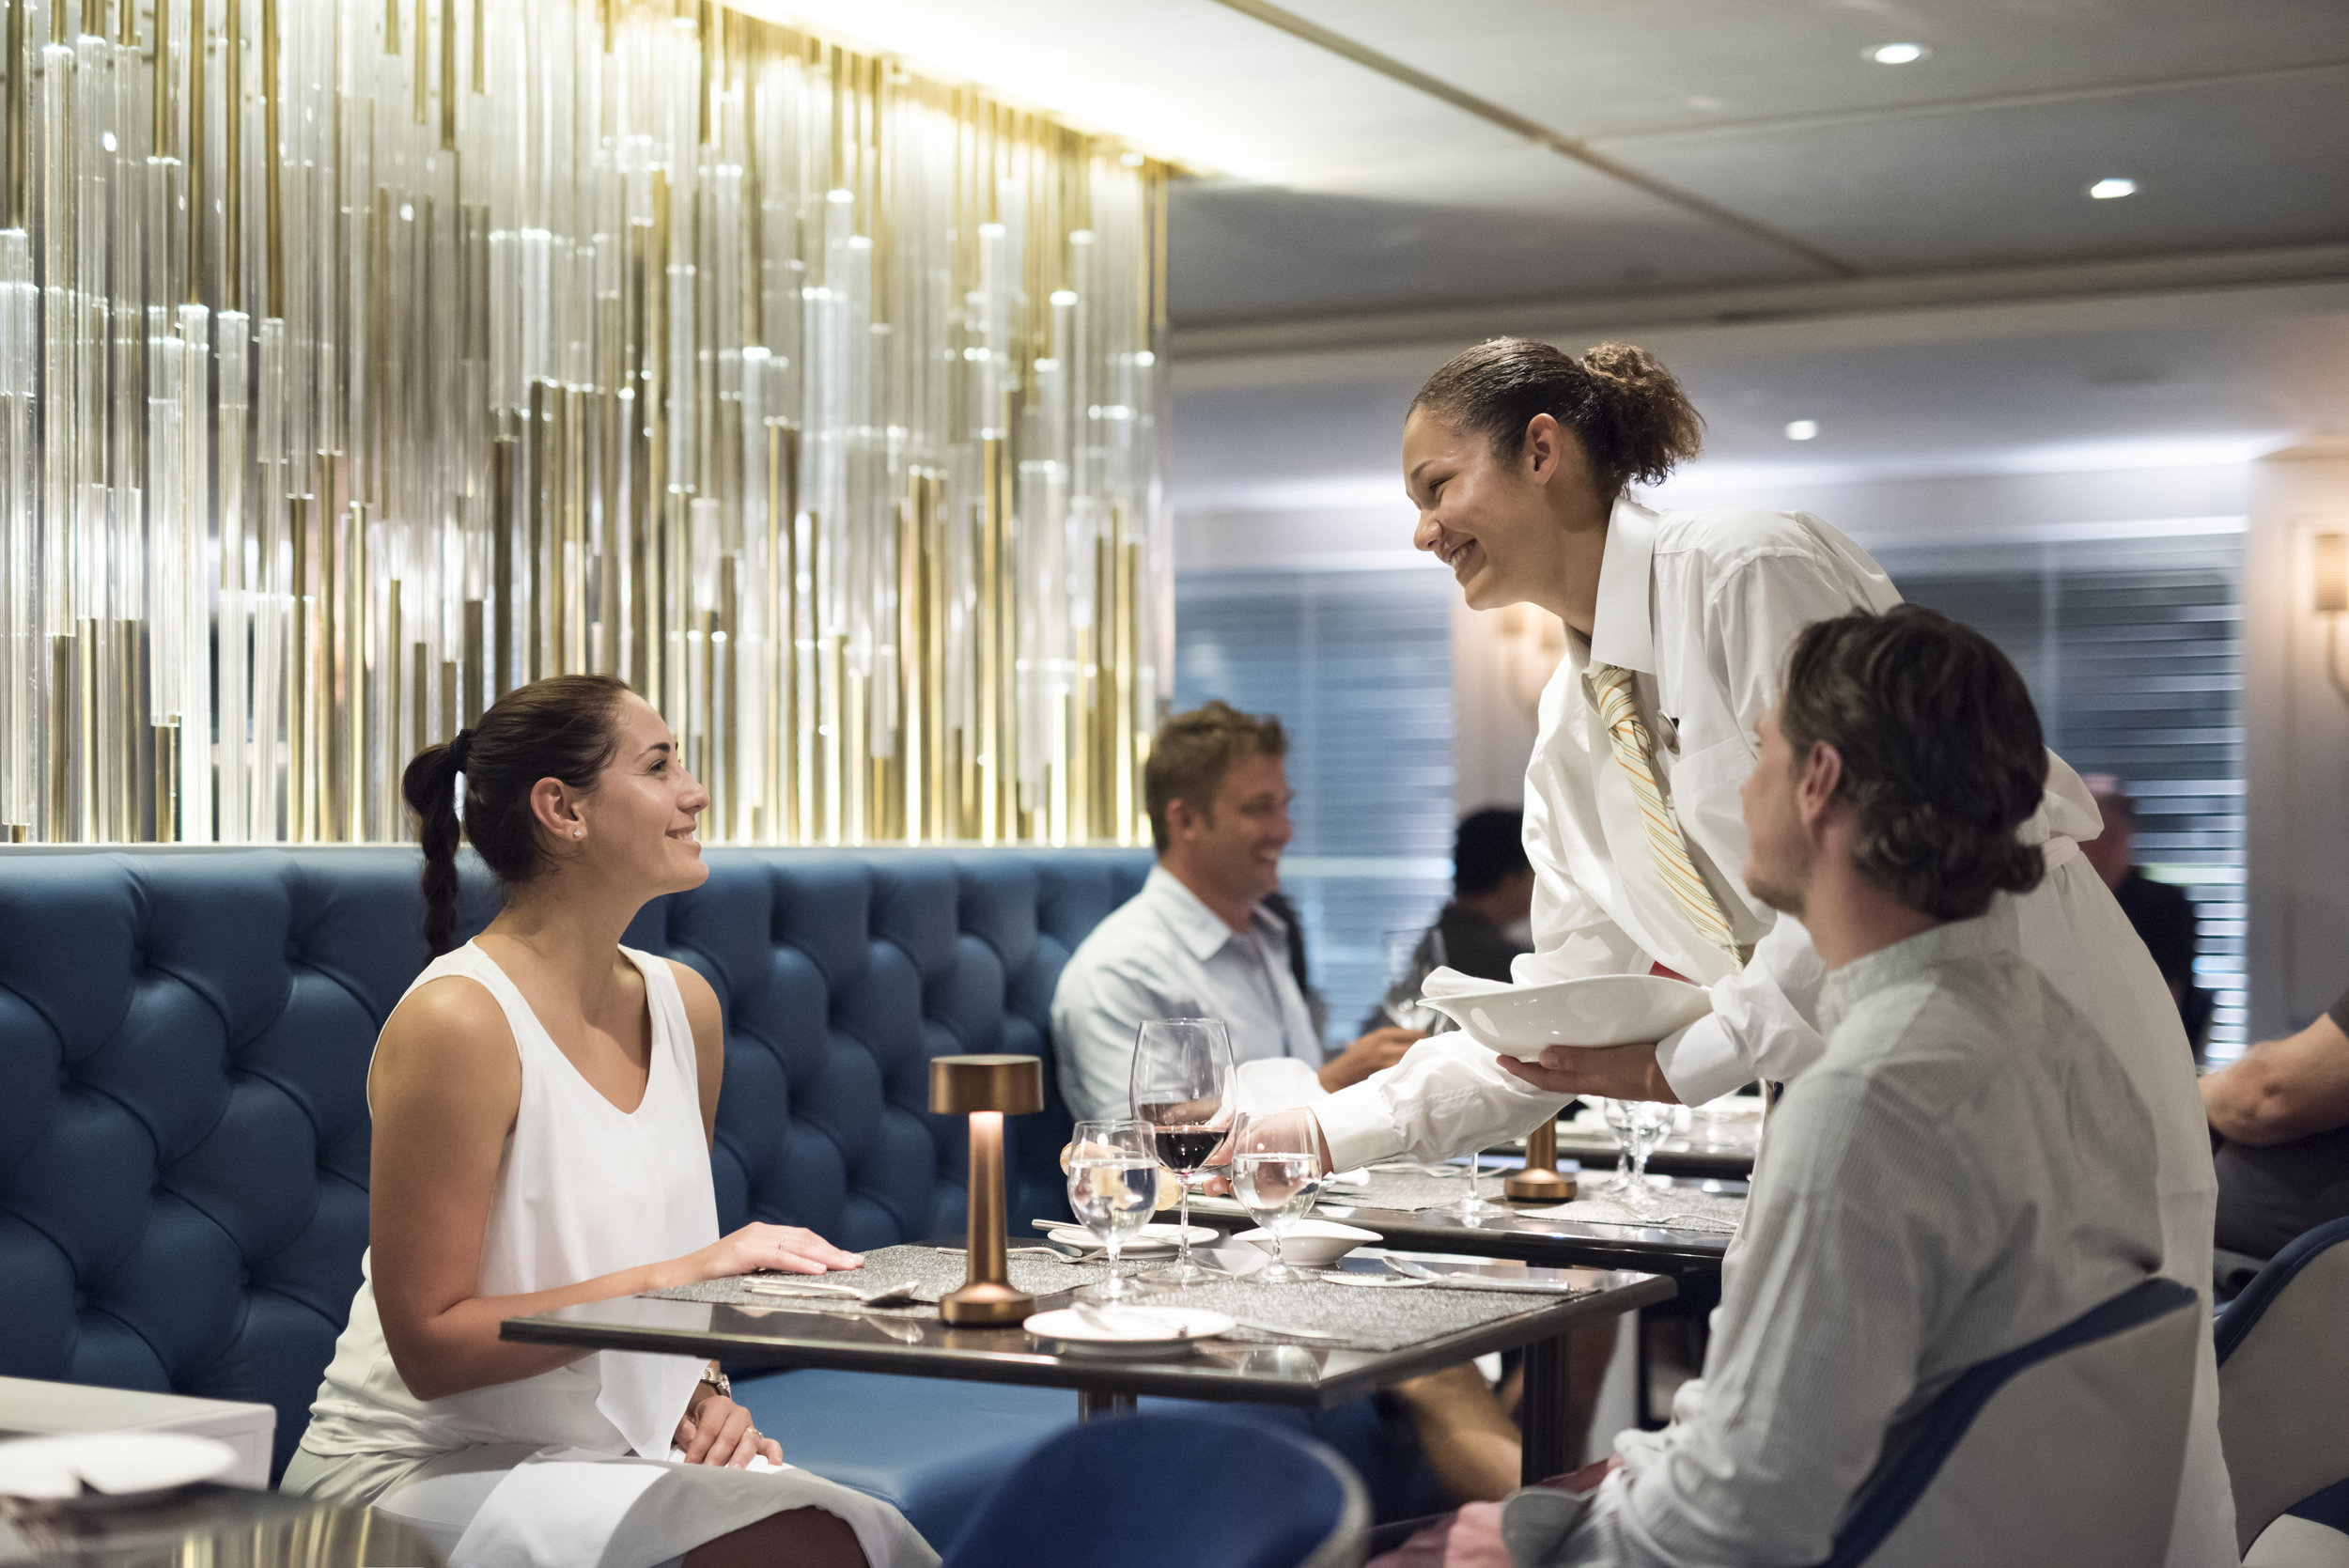 Esprit_YachtClub_Diners.jpg